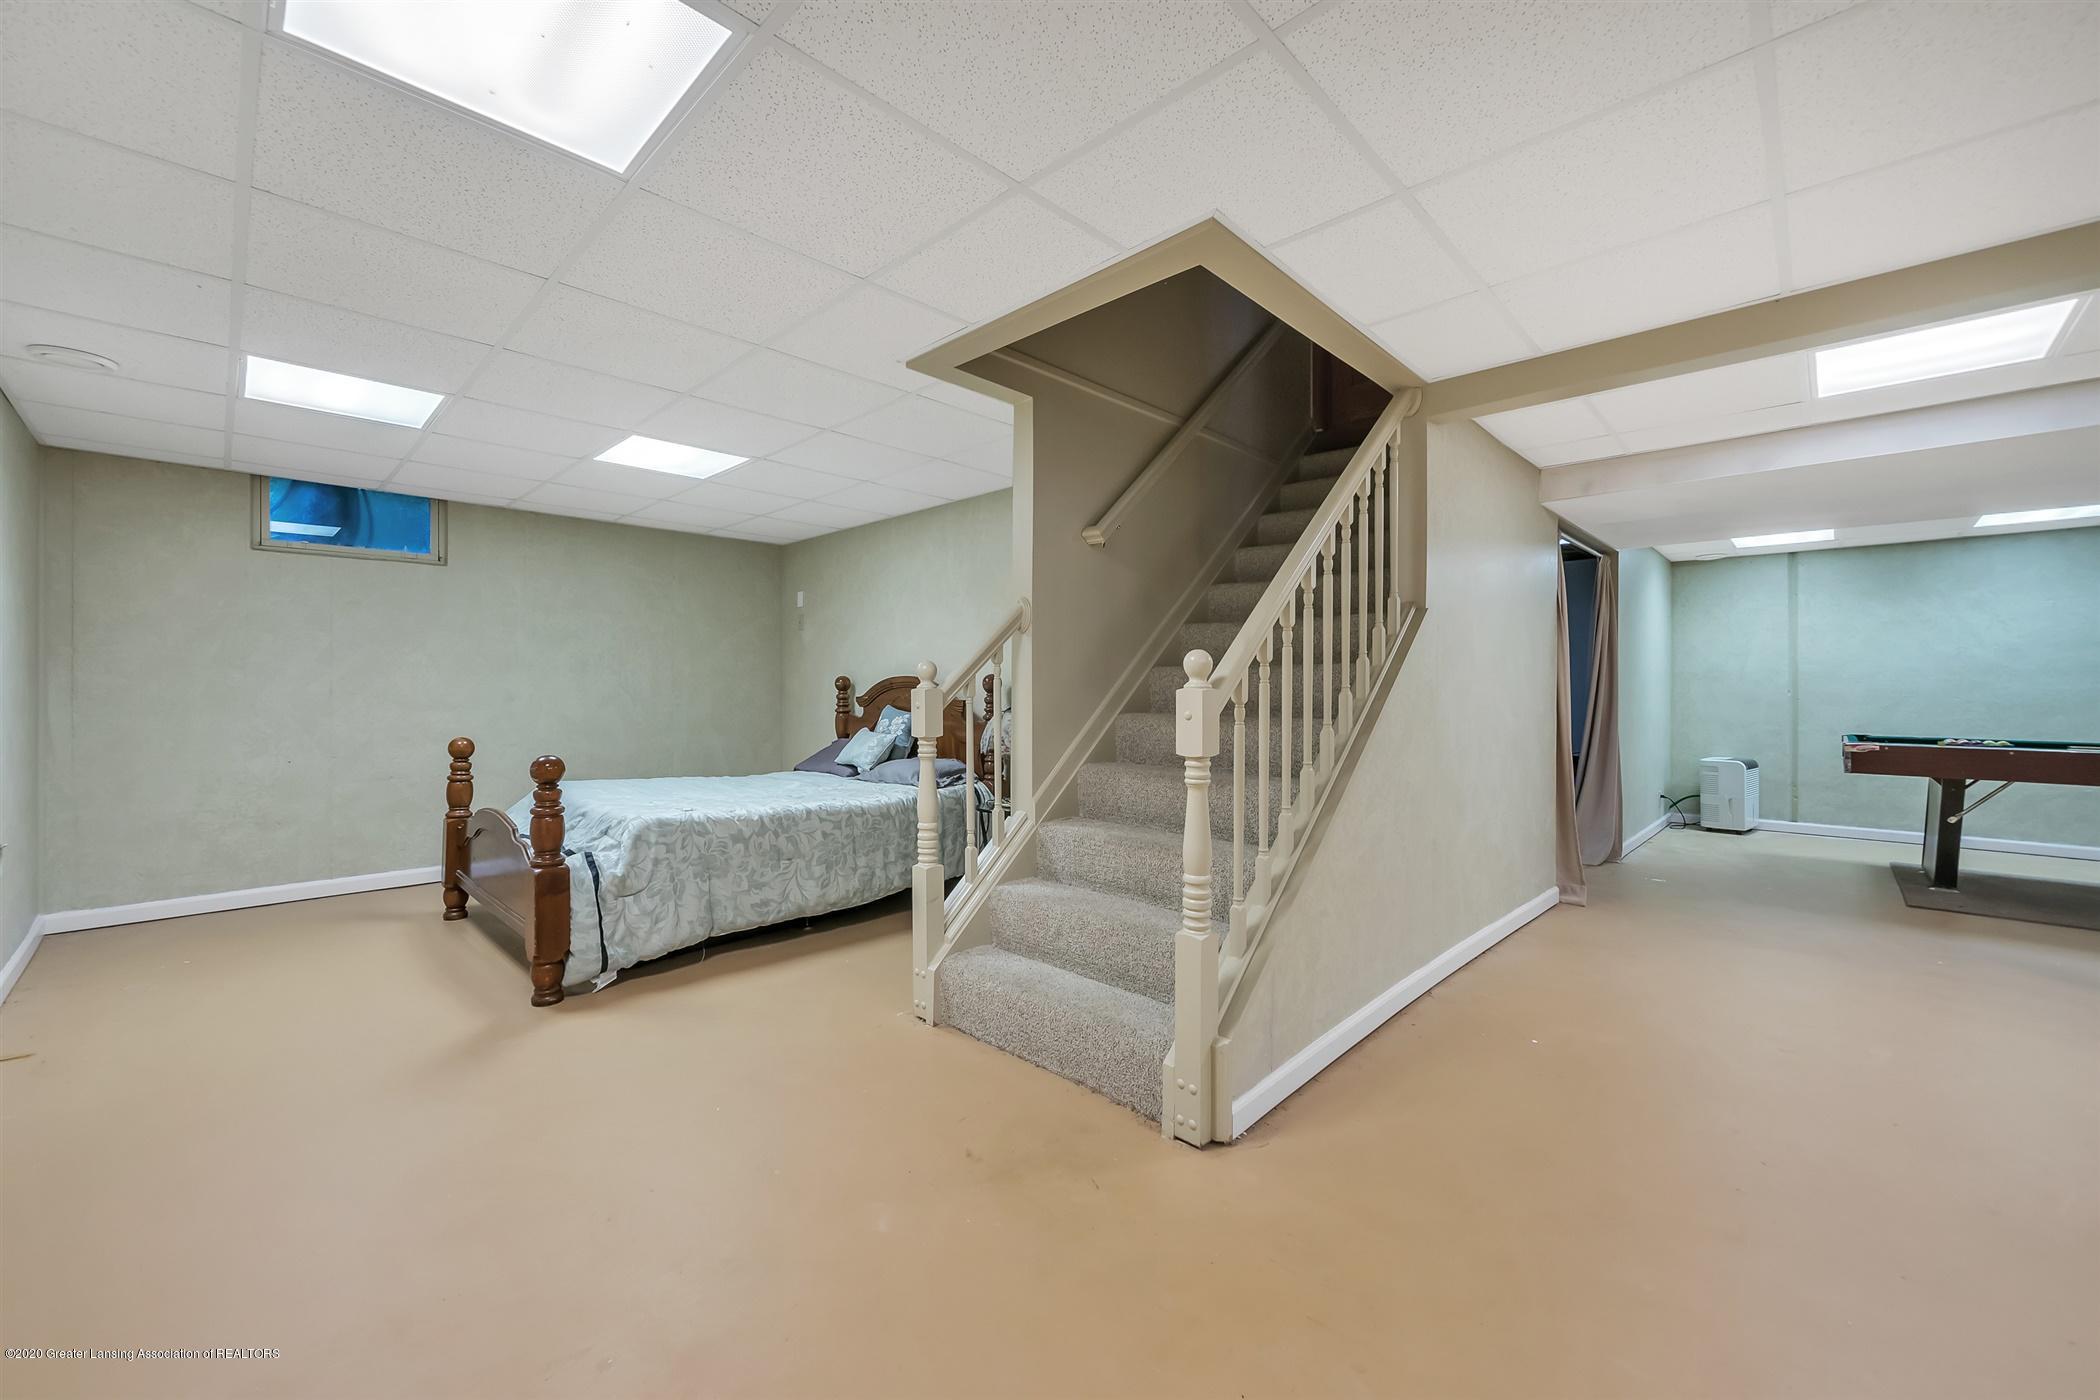 4242 Beeman Rd - LOWER LEVEL Recreation Guest Area - 26